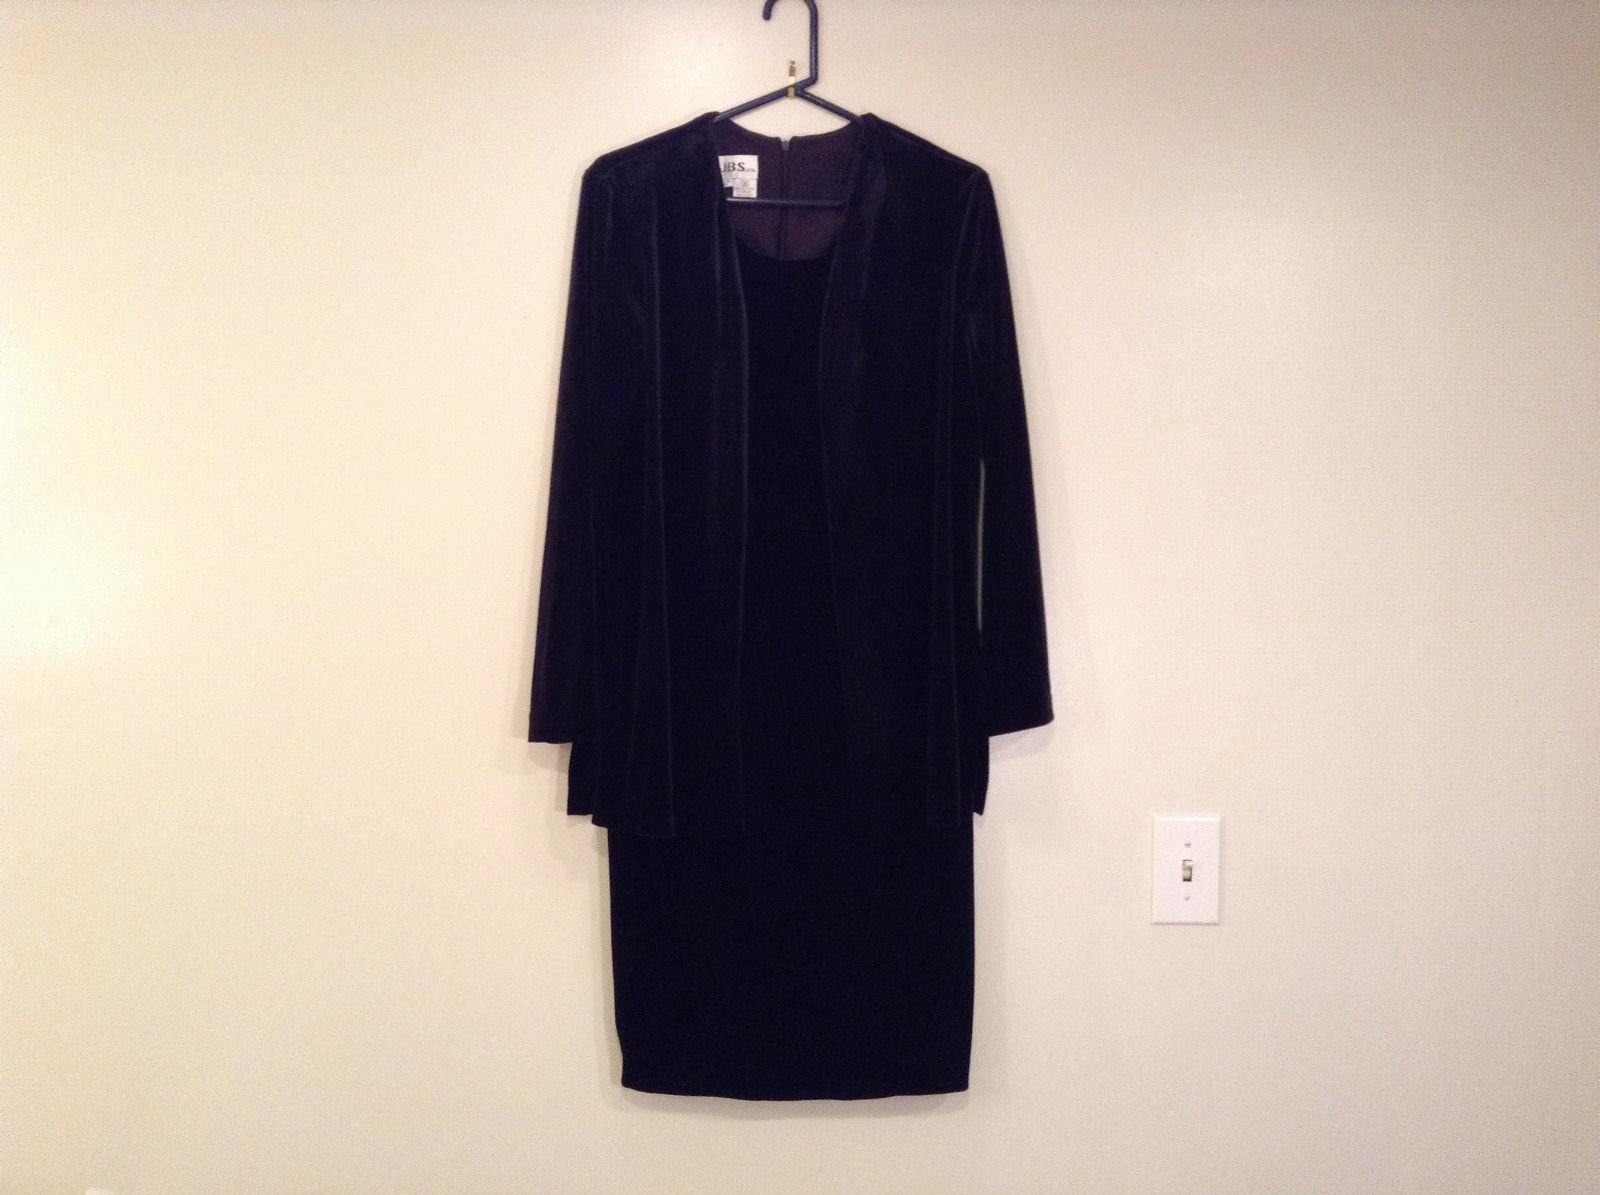 JBS Size 10 Black Velvet Dress and Attached Jacket Back Zipper Closure Very Nice